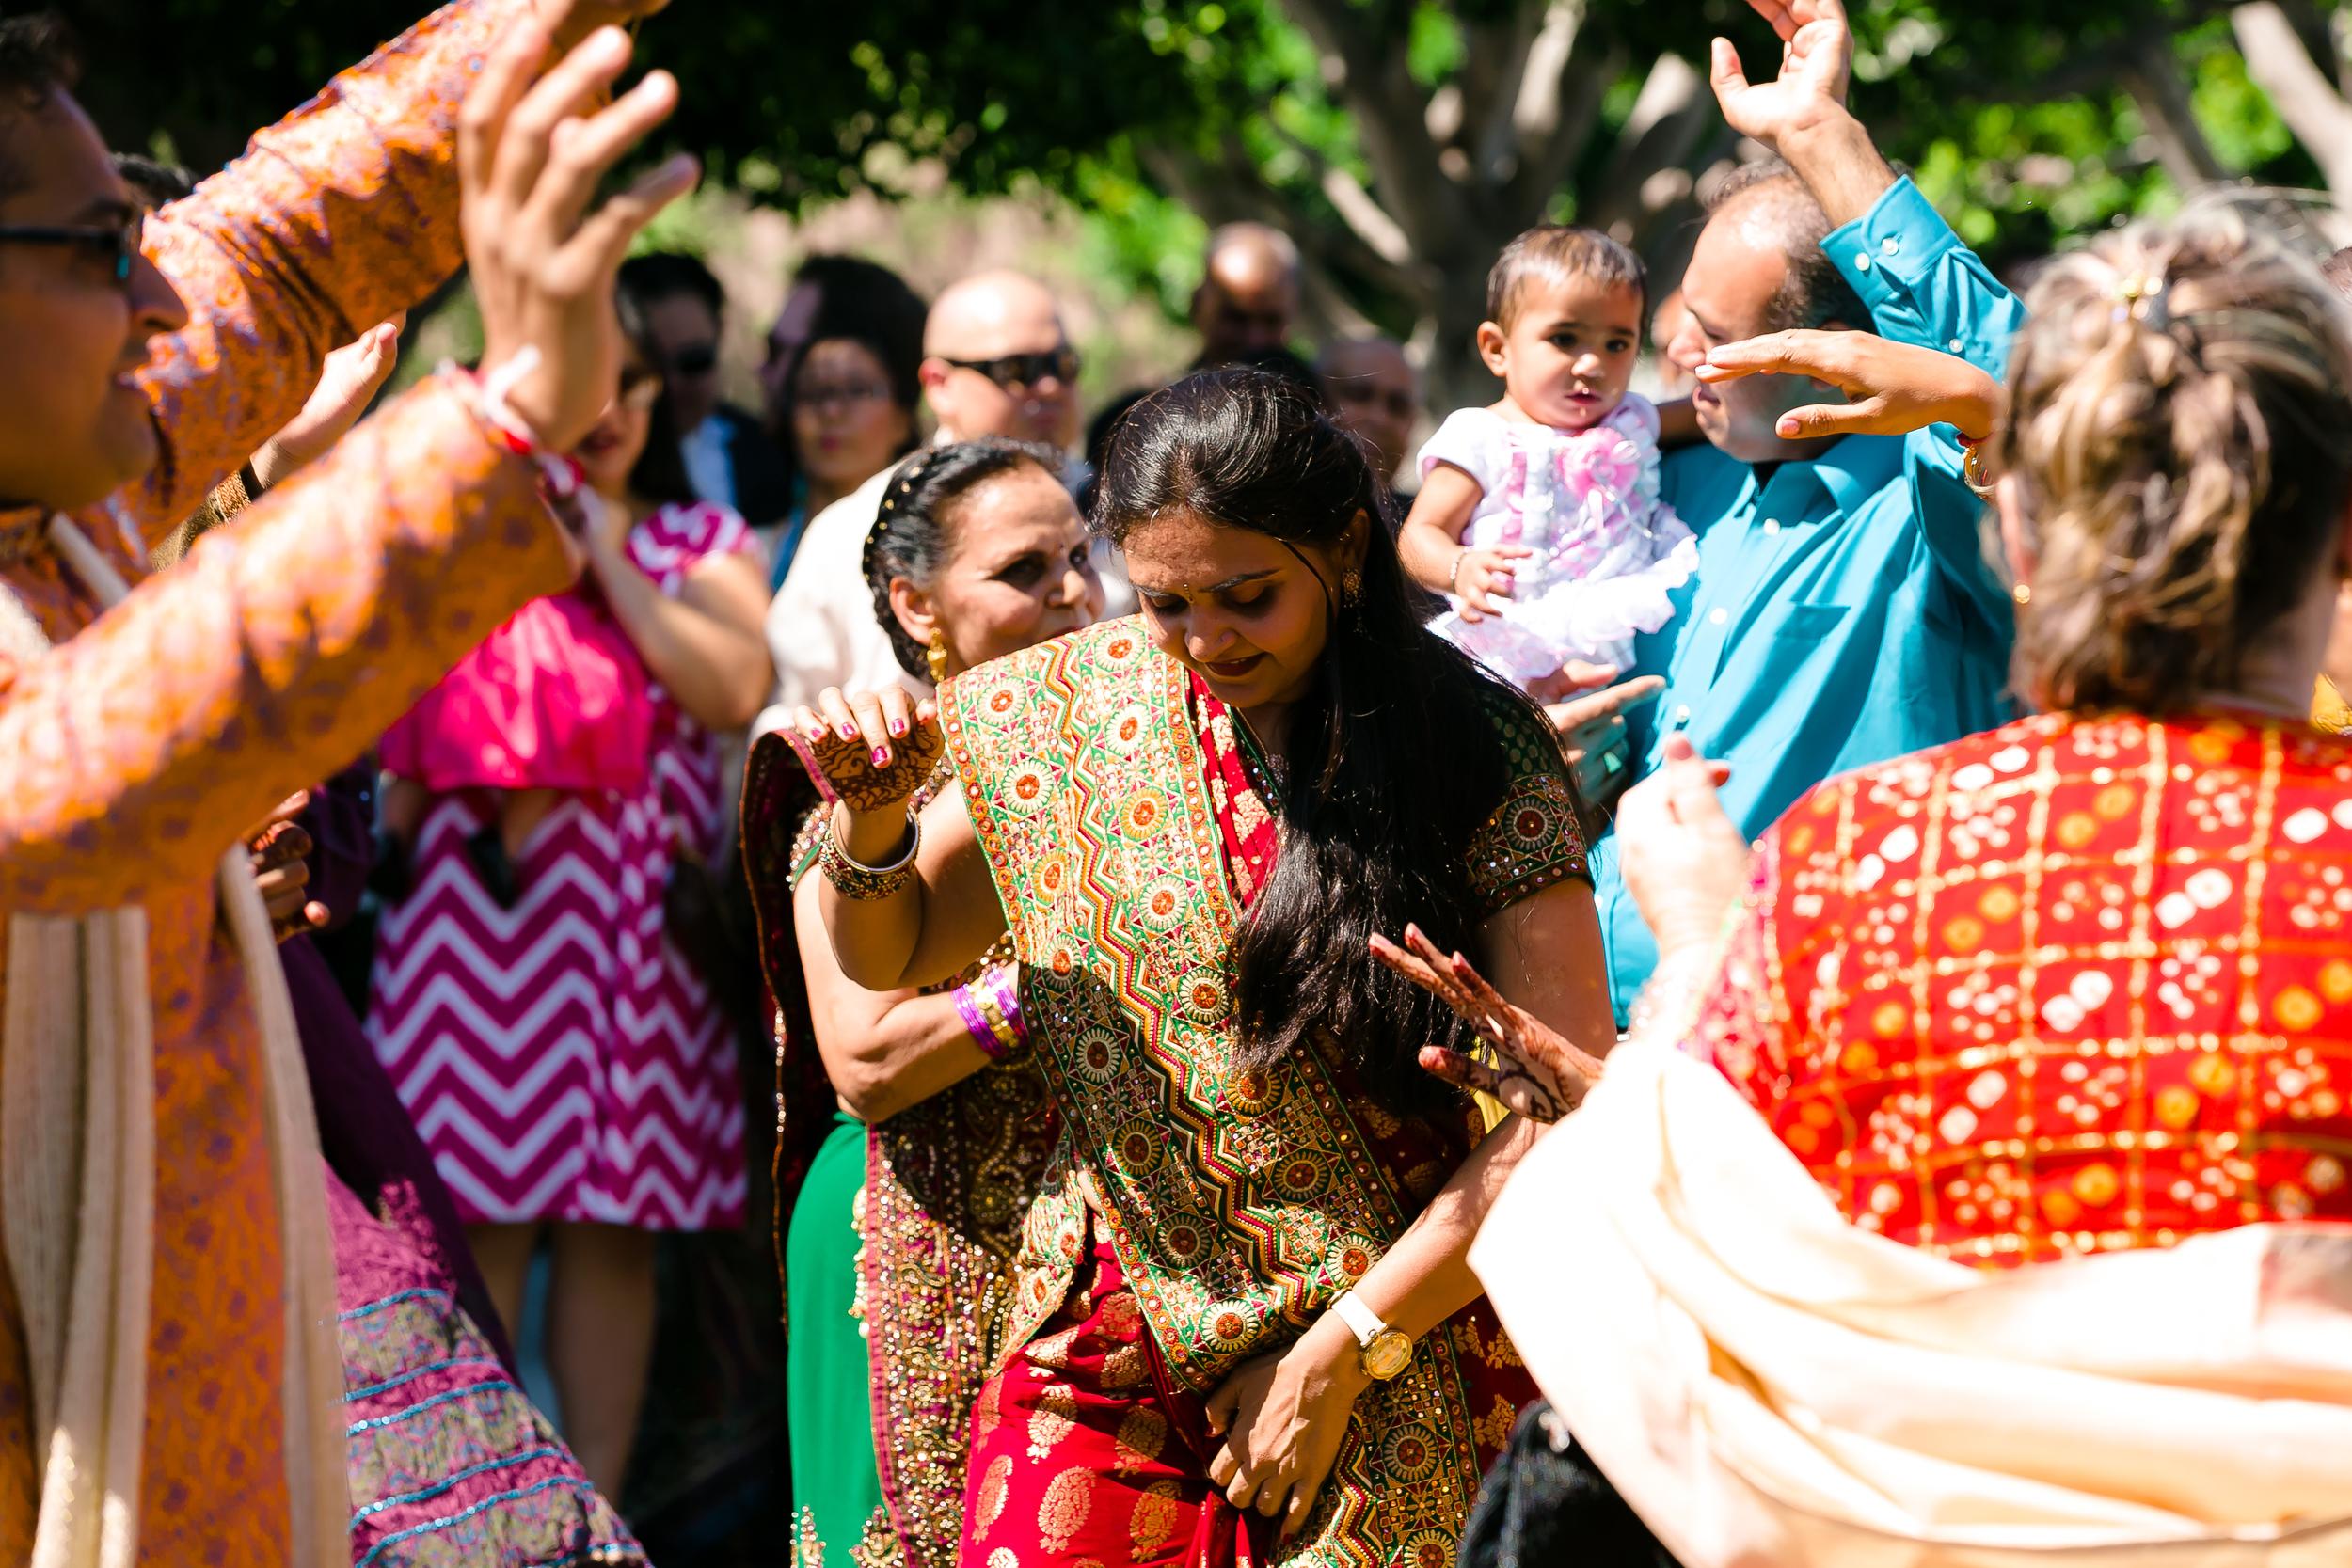 SOUTHEAST-ASIAN-INDIAN-WEDDING_024.jpg